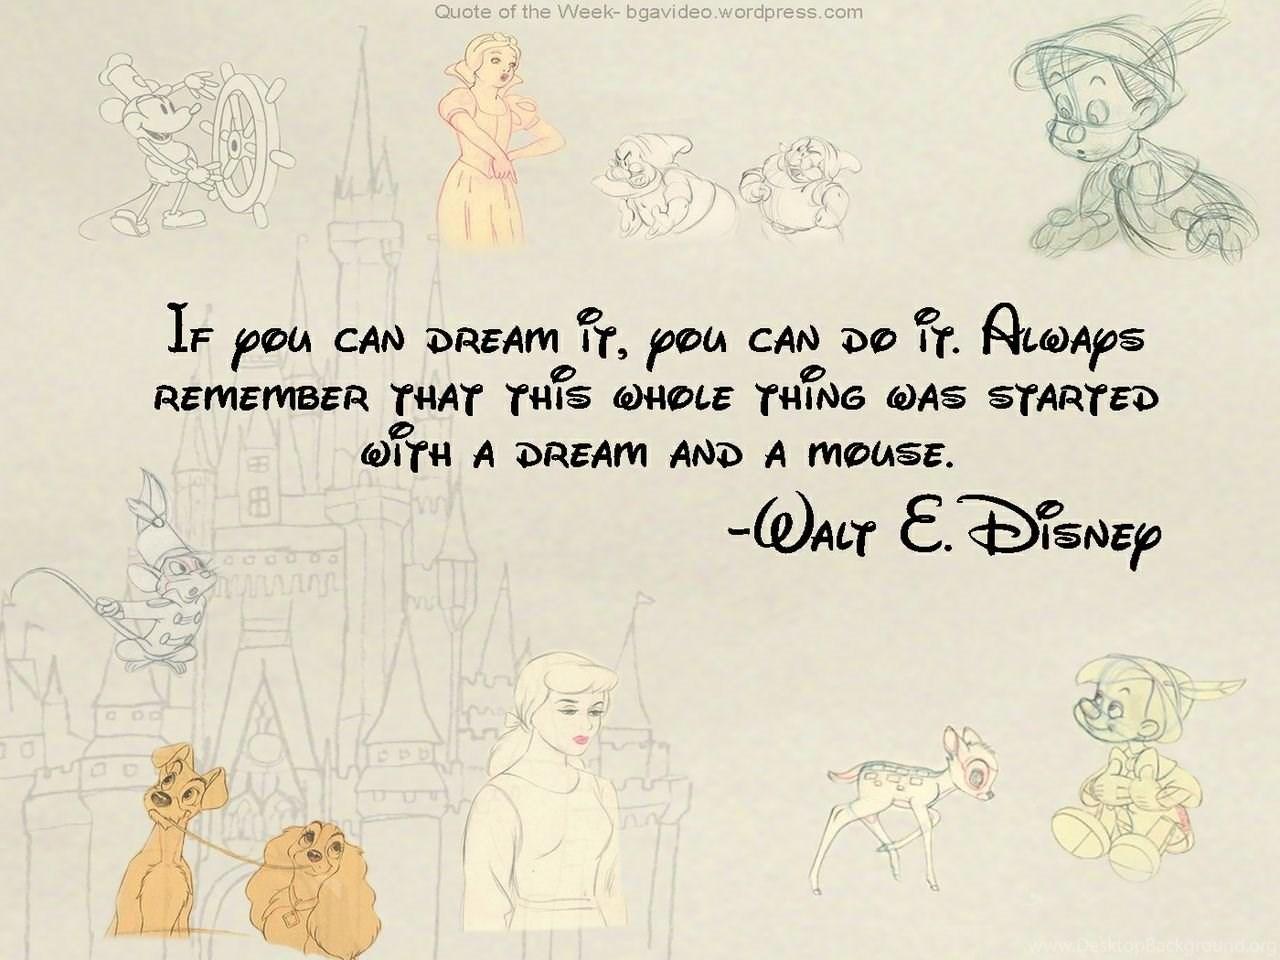 Disney Desktop Wallpaper Hd Tumblr